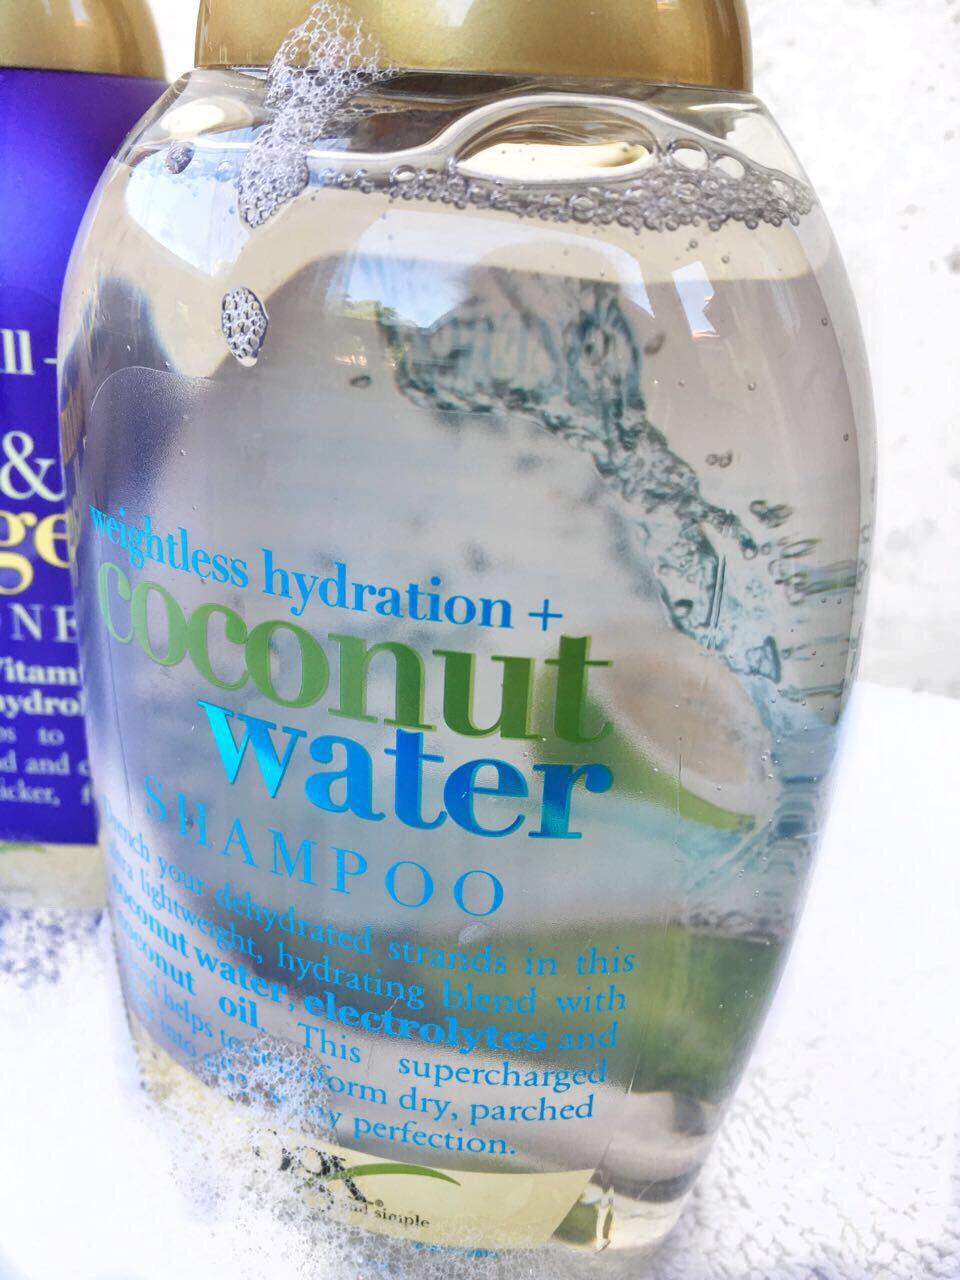 Oshinity Organix shampoo and conditioner review Nairobi Kenya